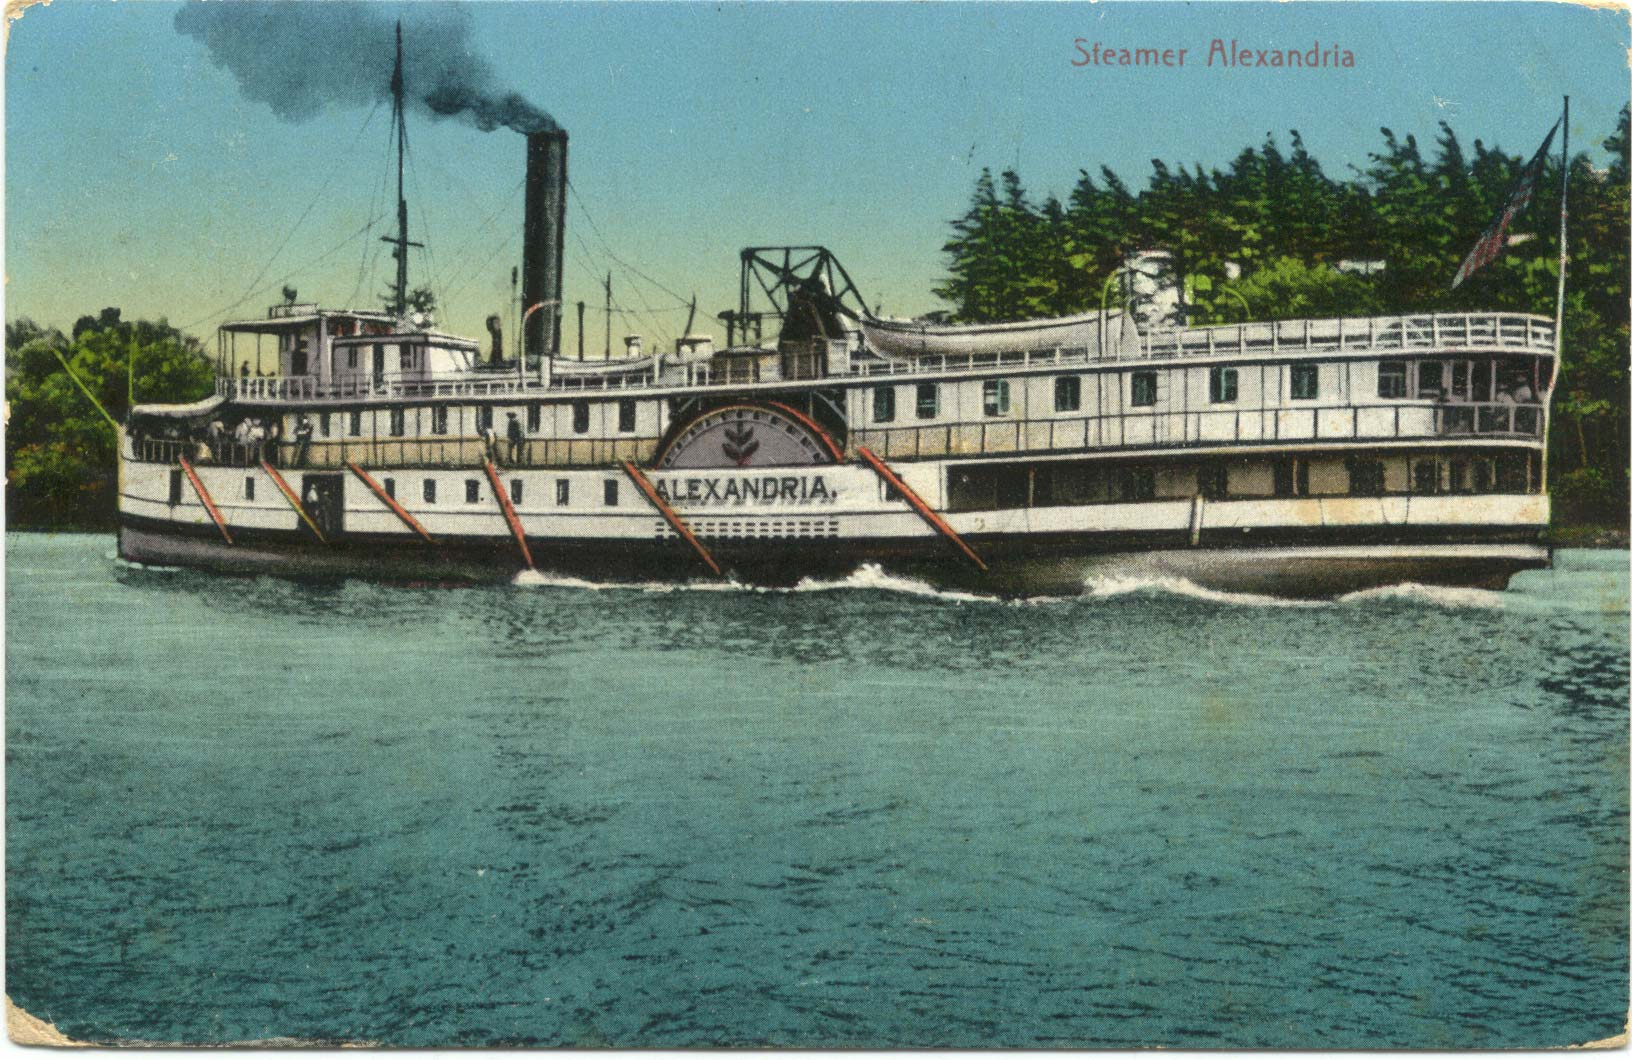 Steamer Alexandria